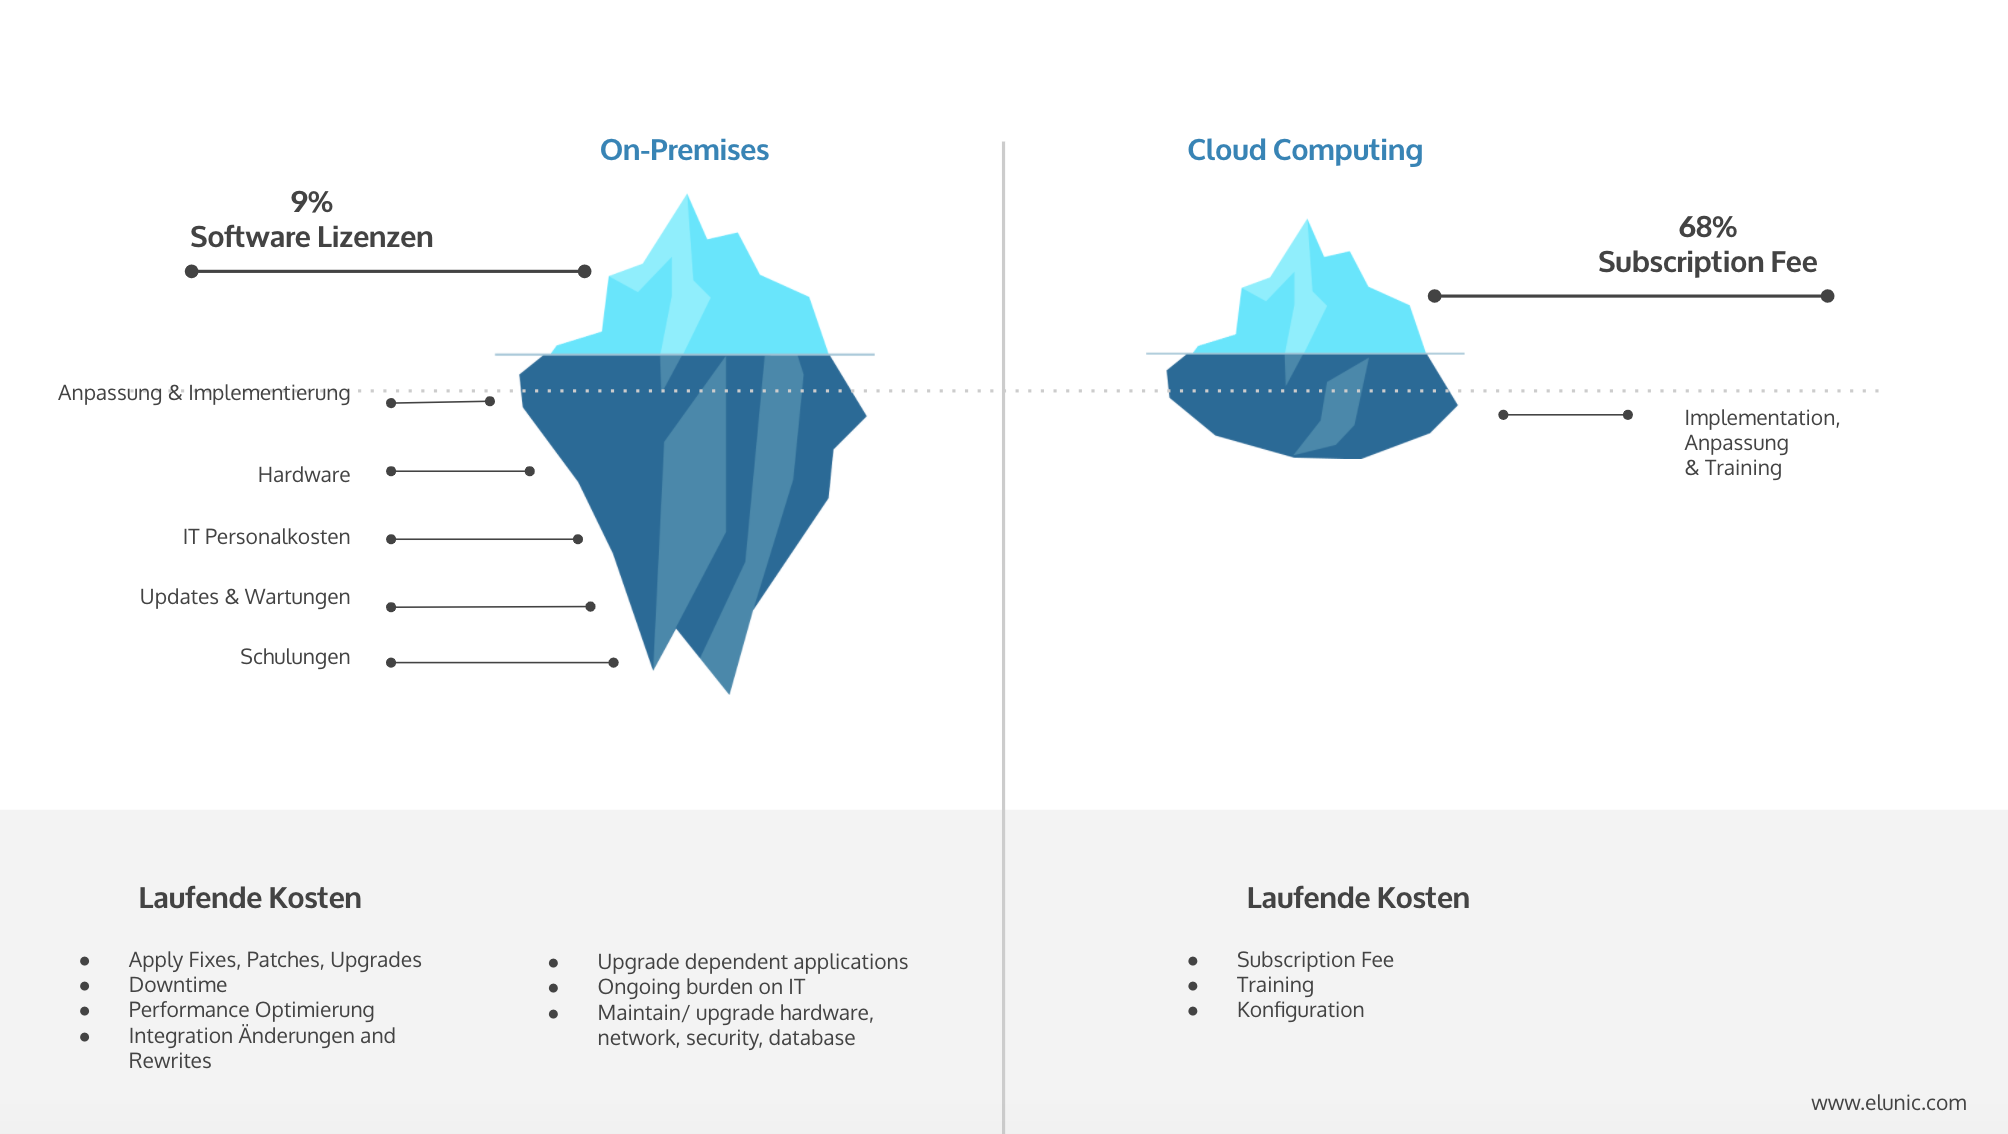 Kosten - Cloud vs On-Premises